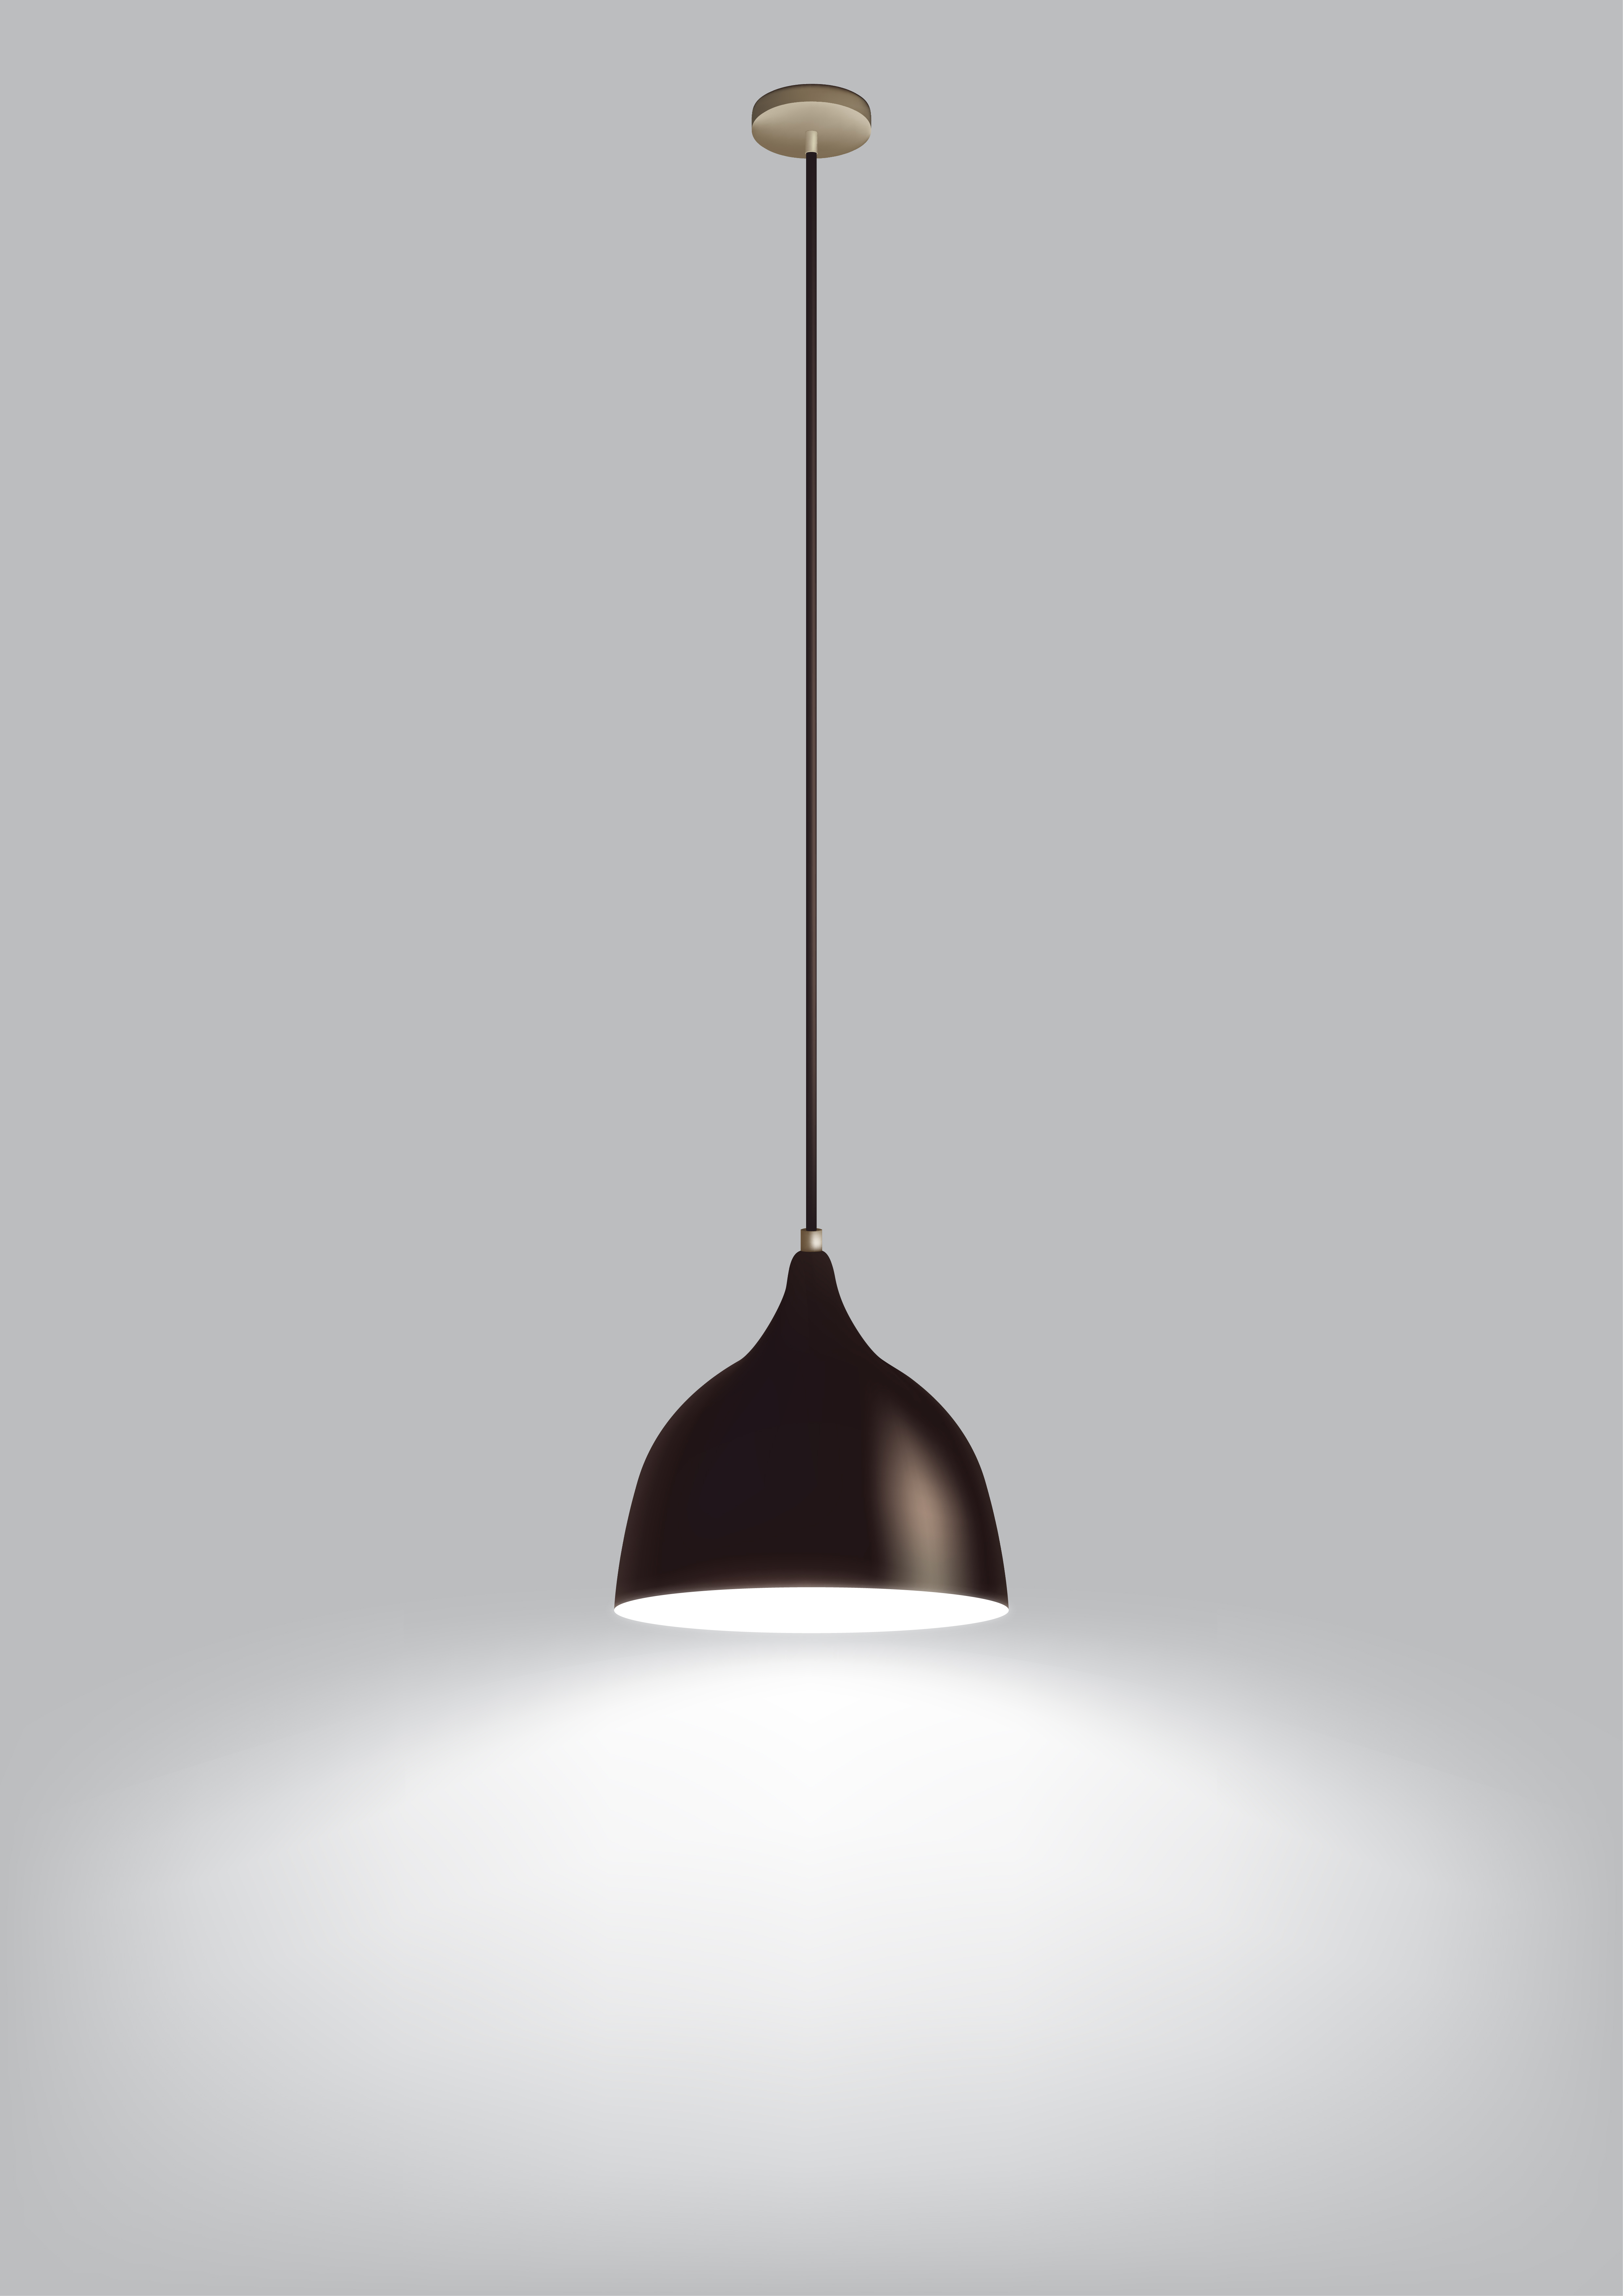 Black Ceiling Lamp Download Free Vectors Clipart Graphics Amp Vector Art